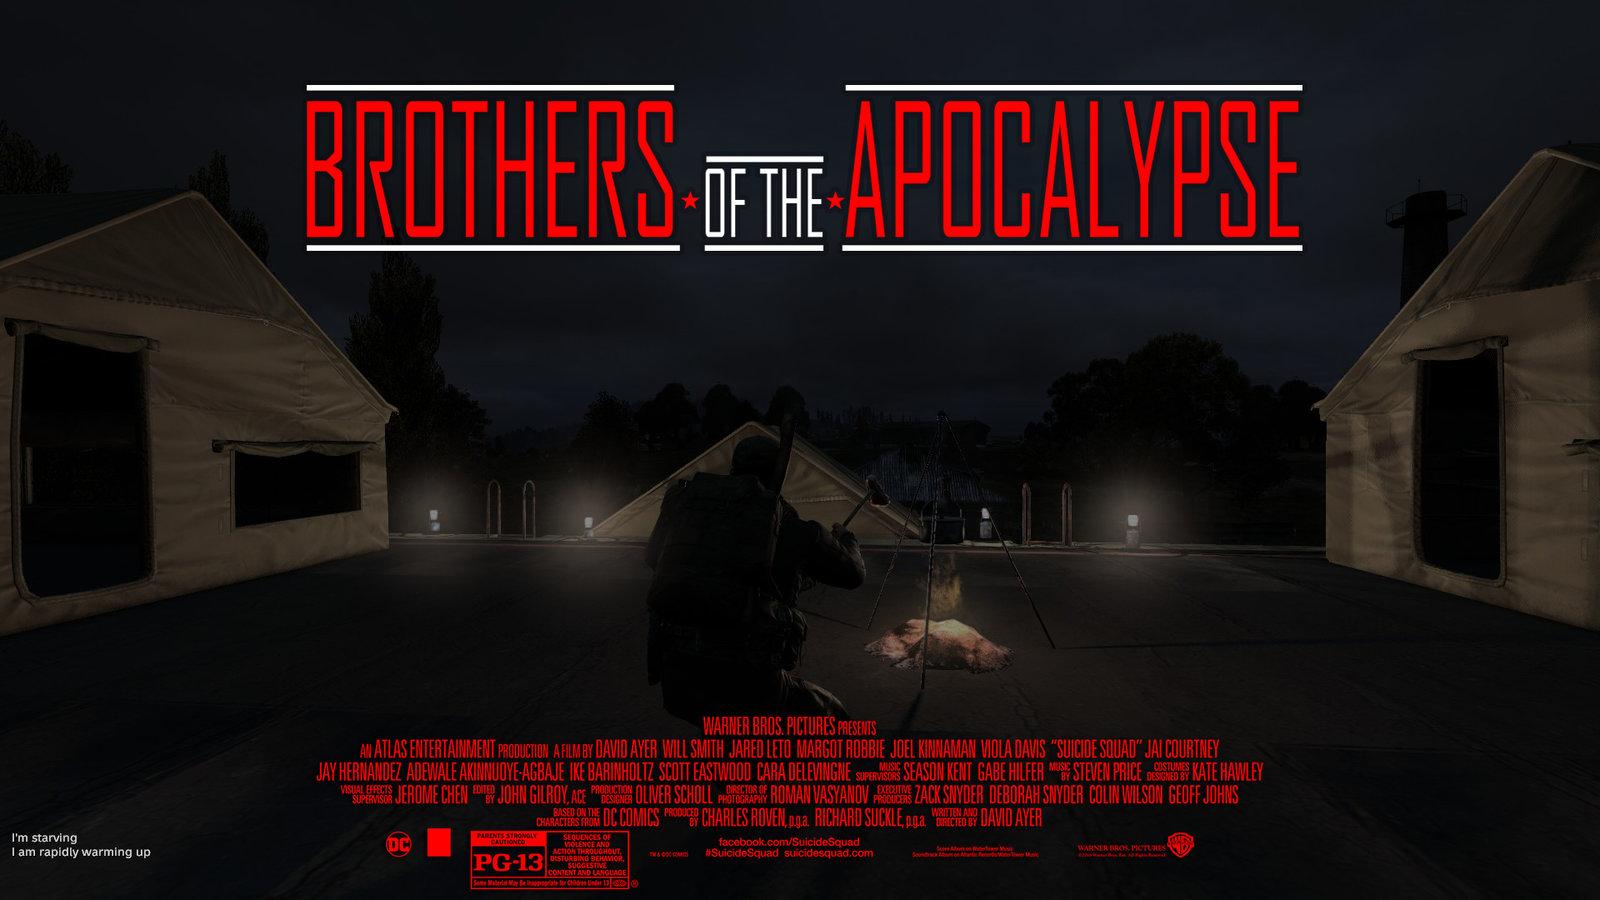 Brothers Of The Apocalypse movie postr